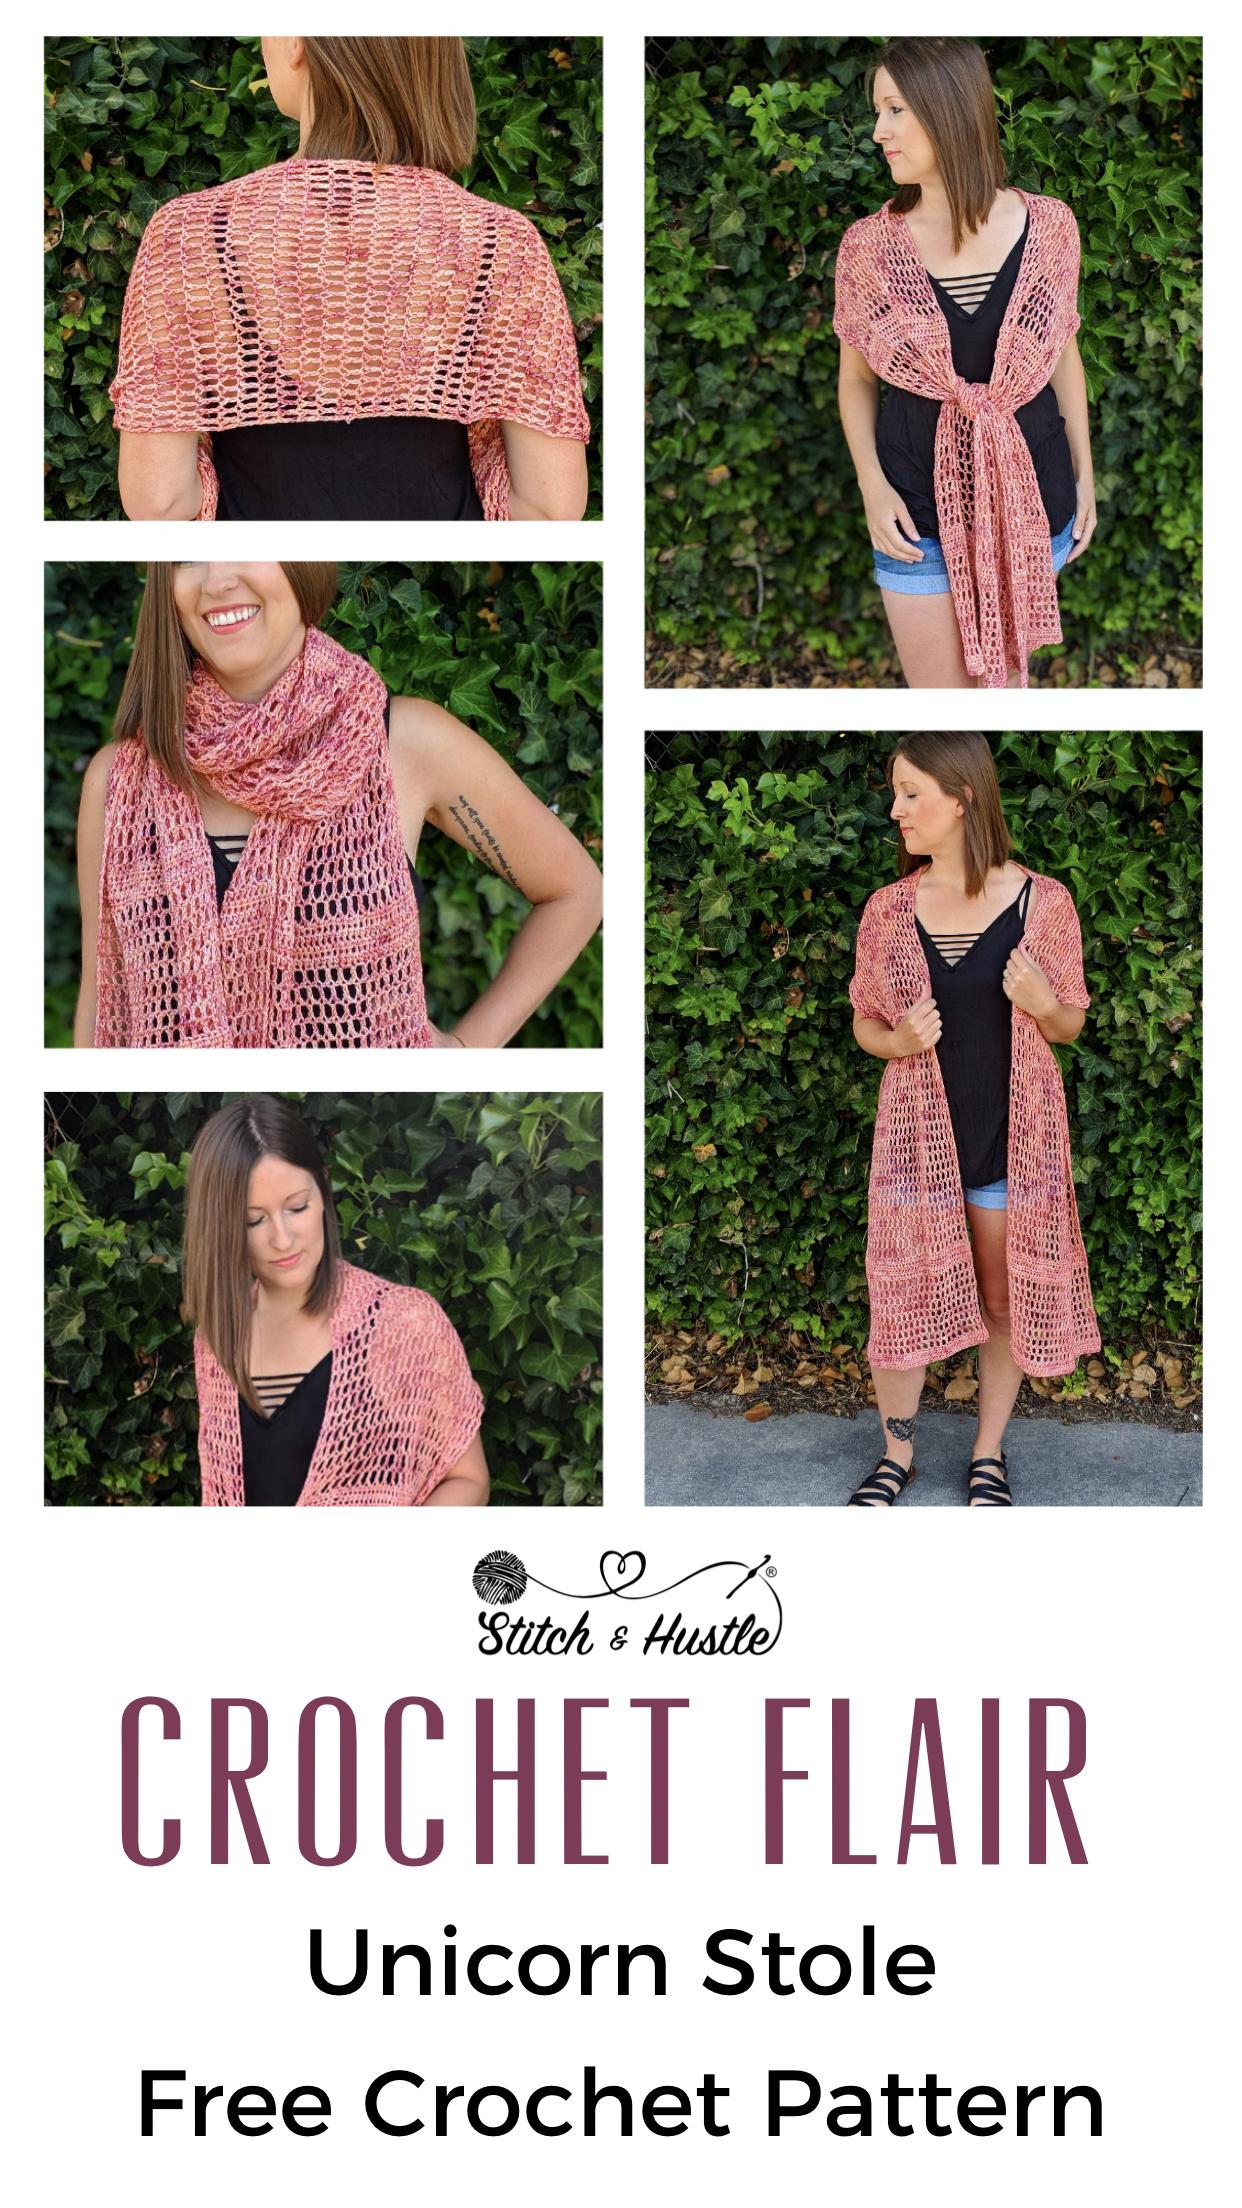 UnicornStole_Free_Crochet_Pattern_1g.jpg